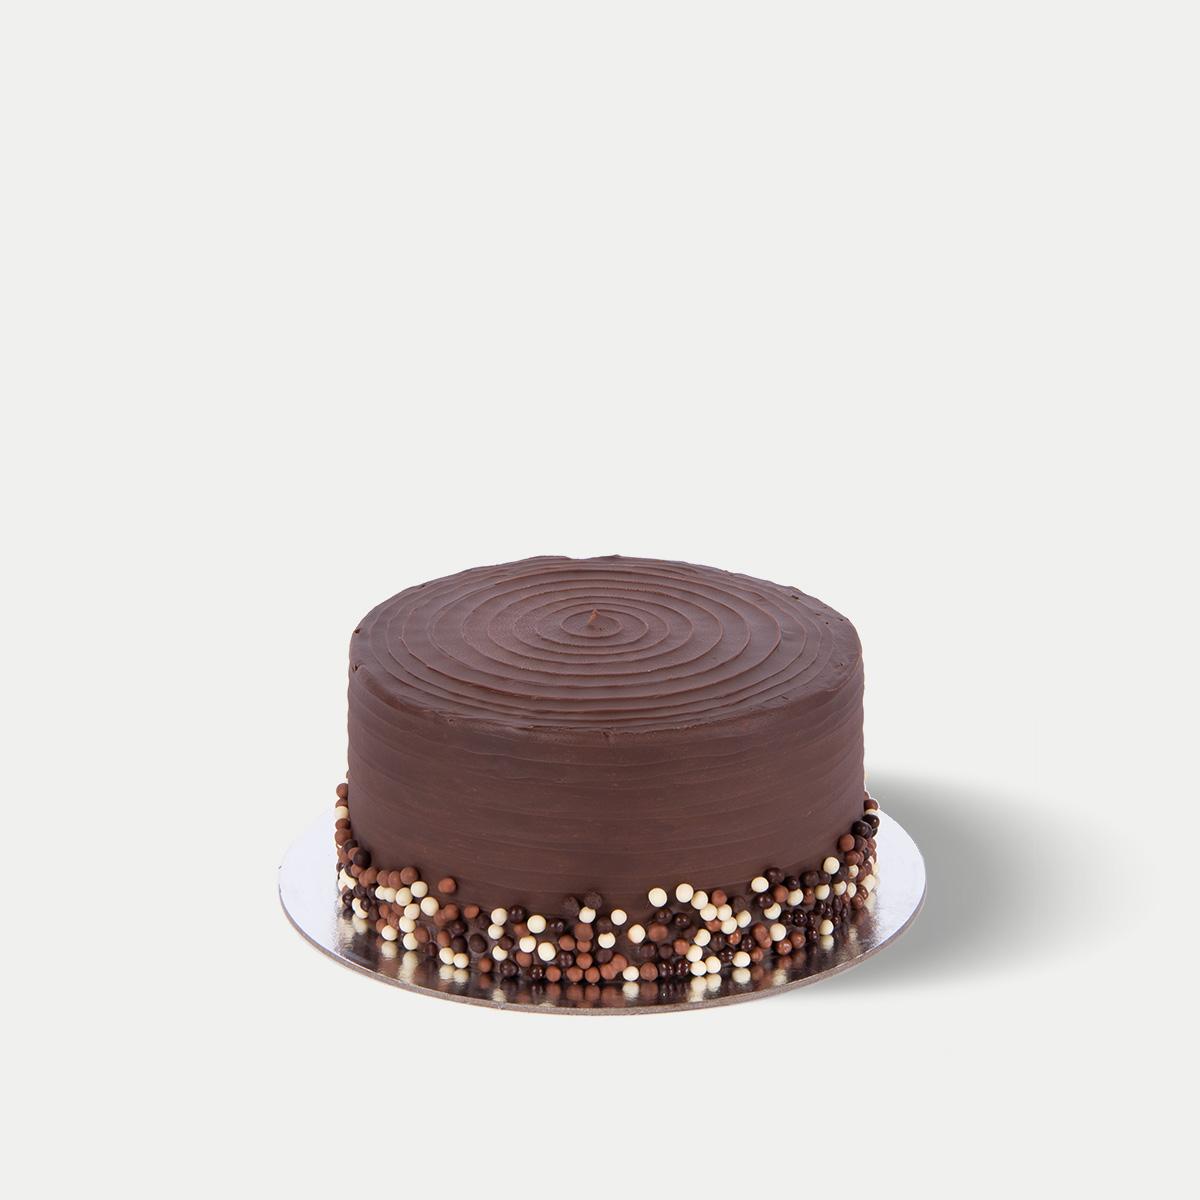 BELGIAN CHOCOLATE 1 KG